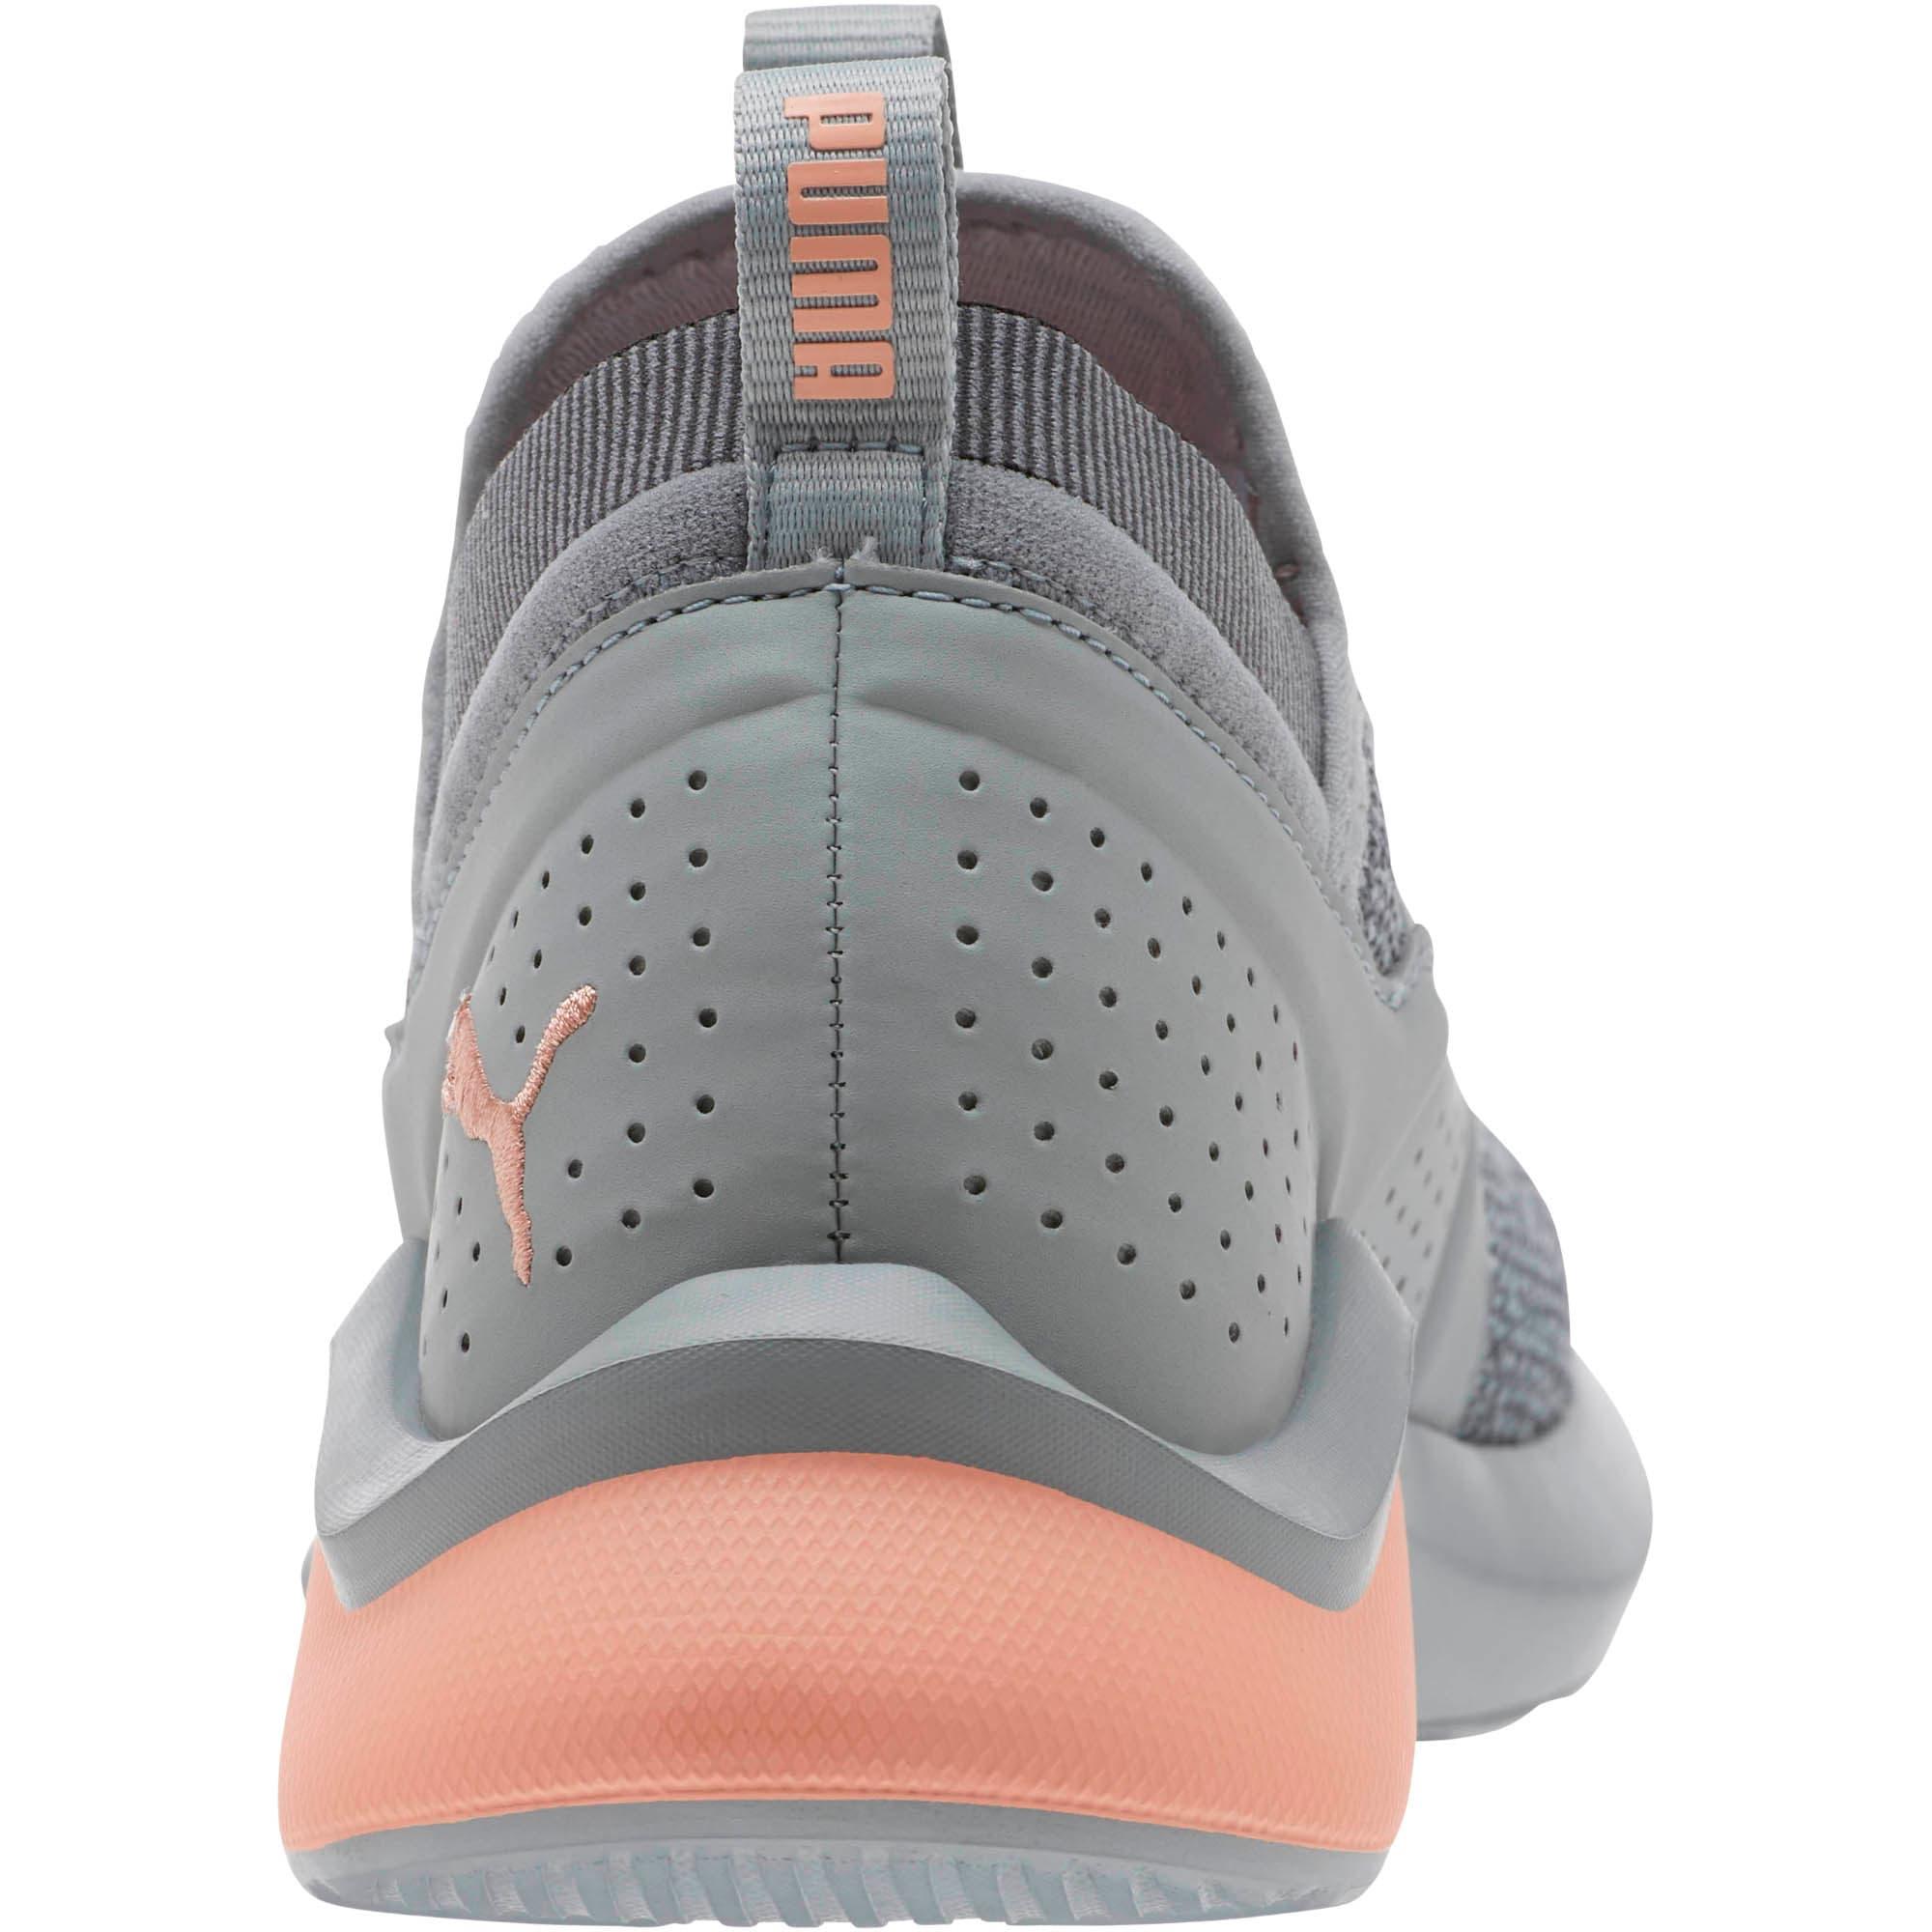 Thumbnail 4 of Emergence Women's Sneakers, Quarry-Peach Bud, medium